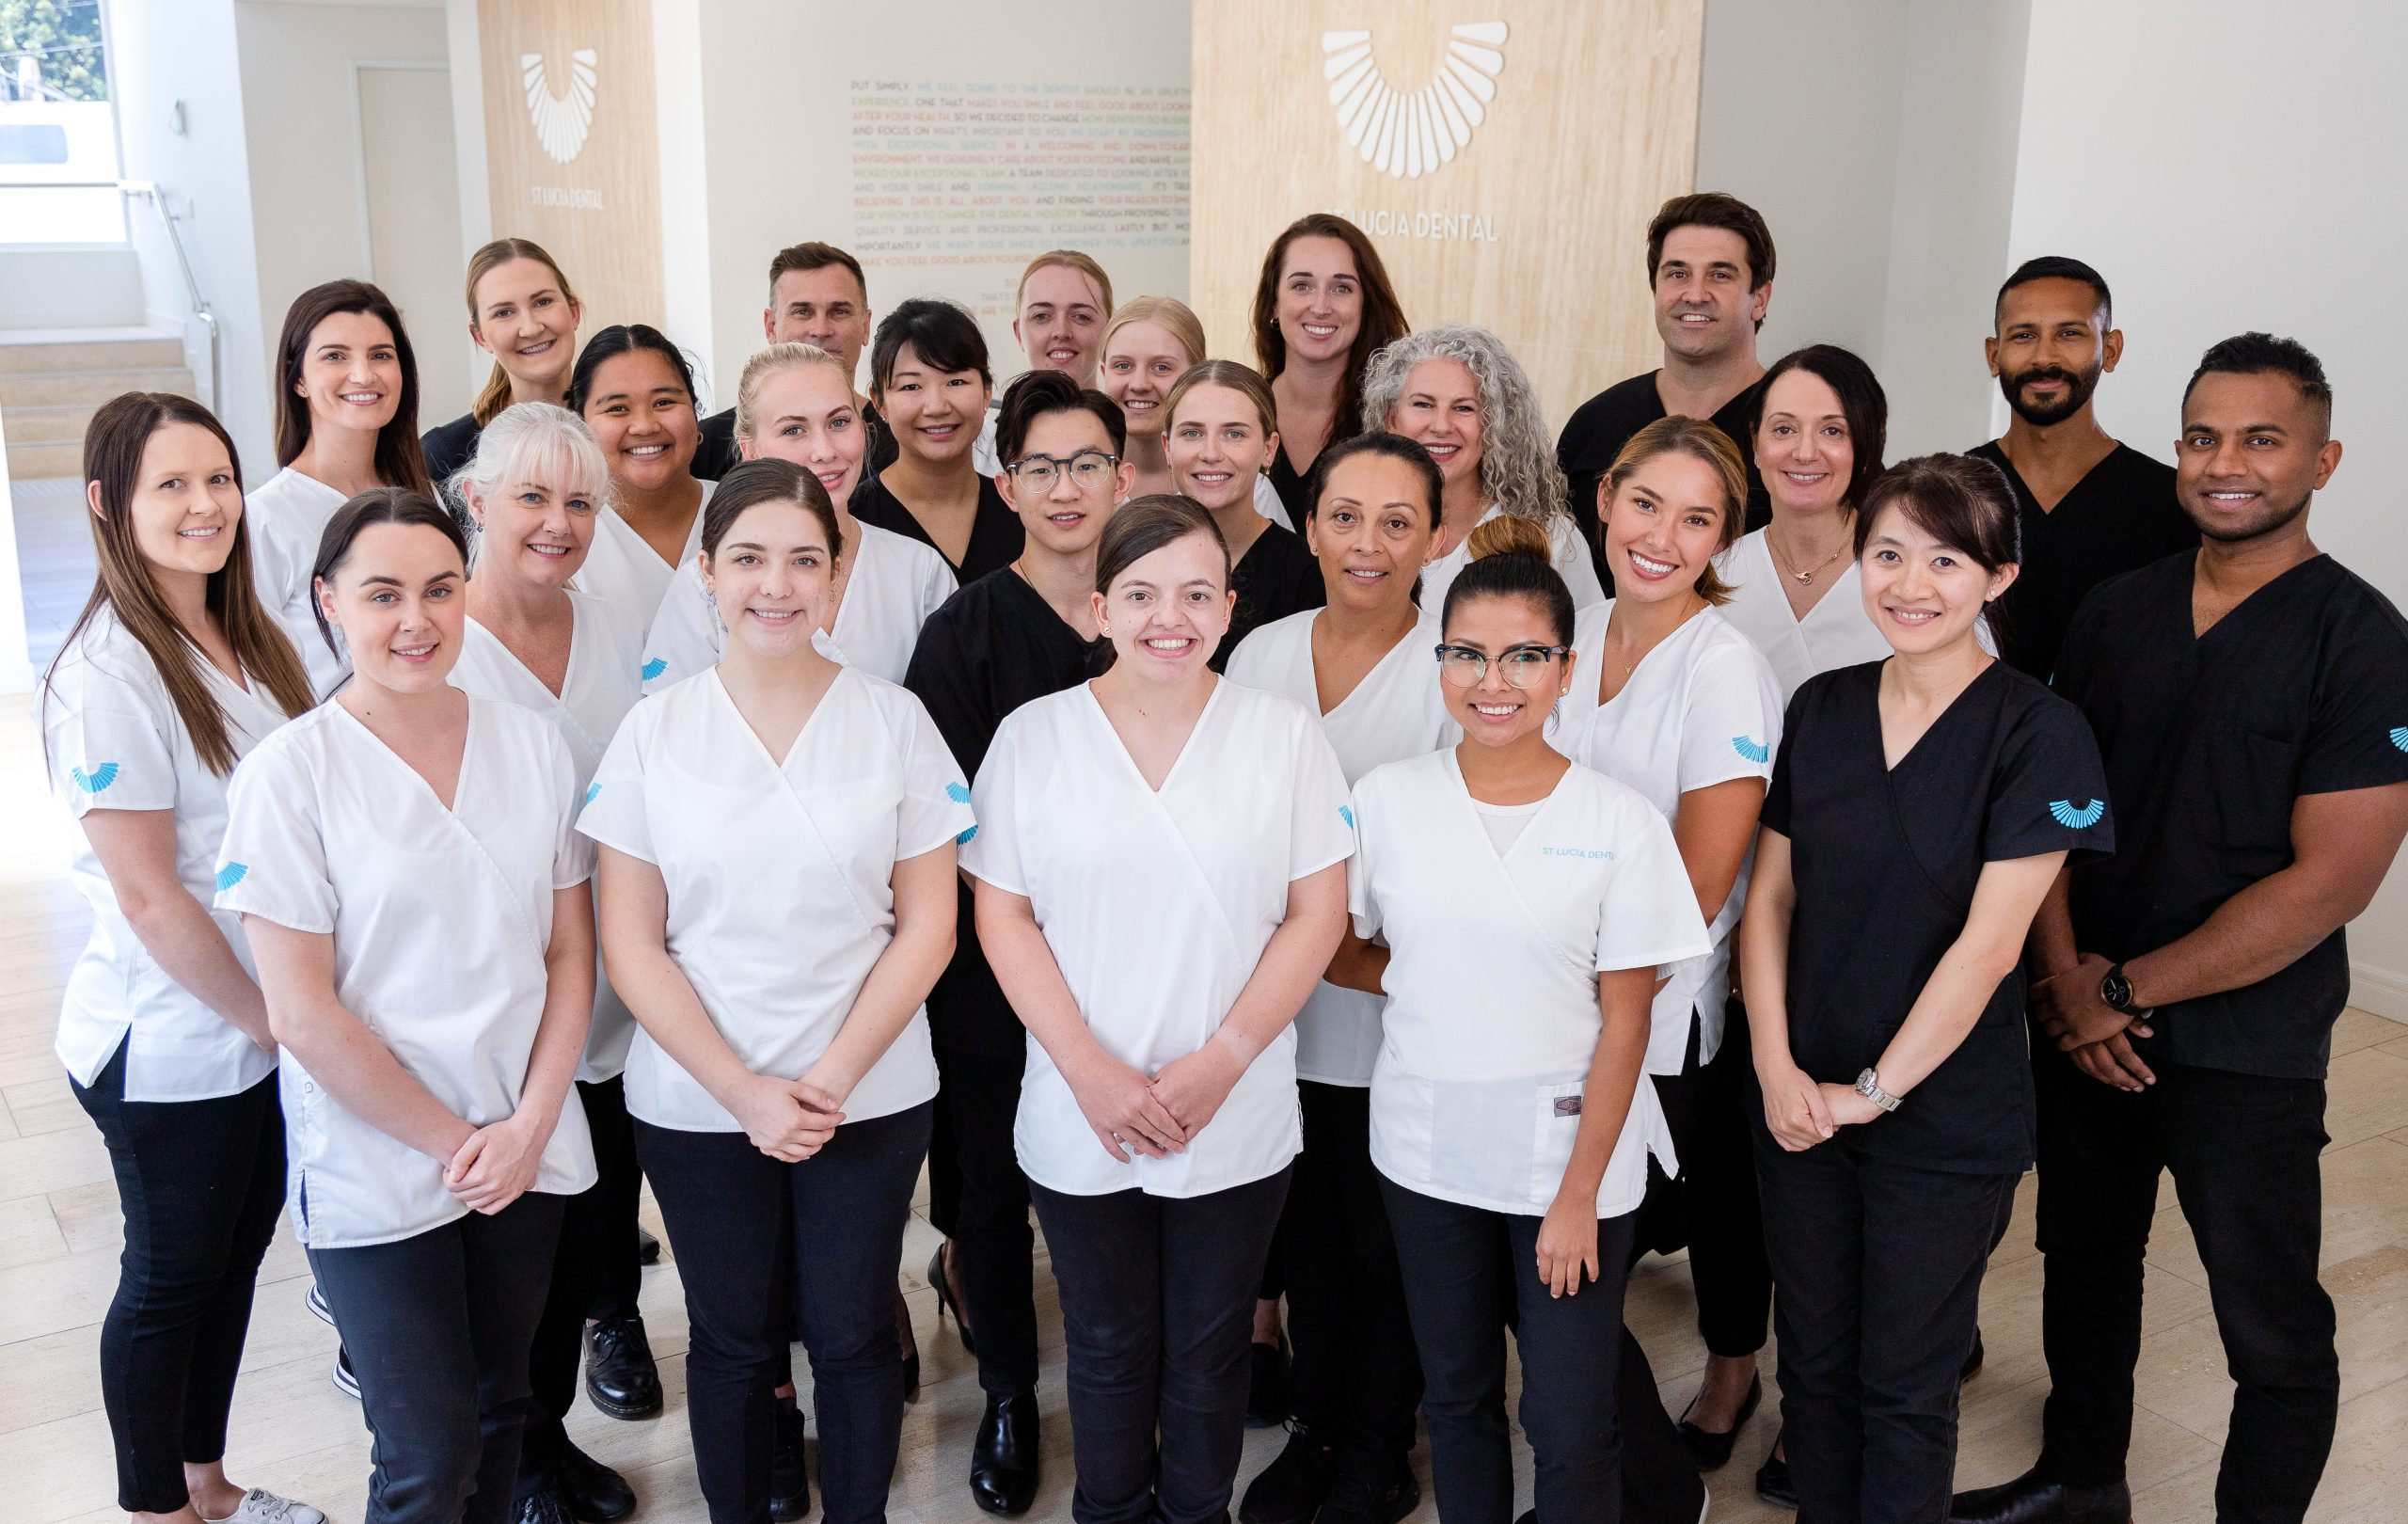 St lucia dental team